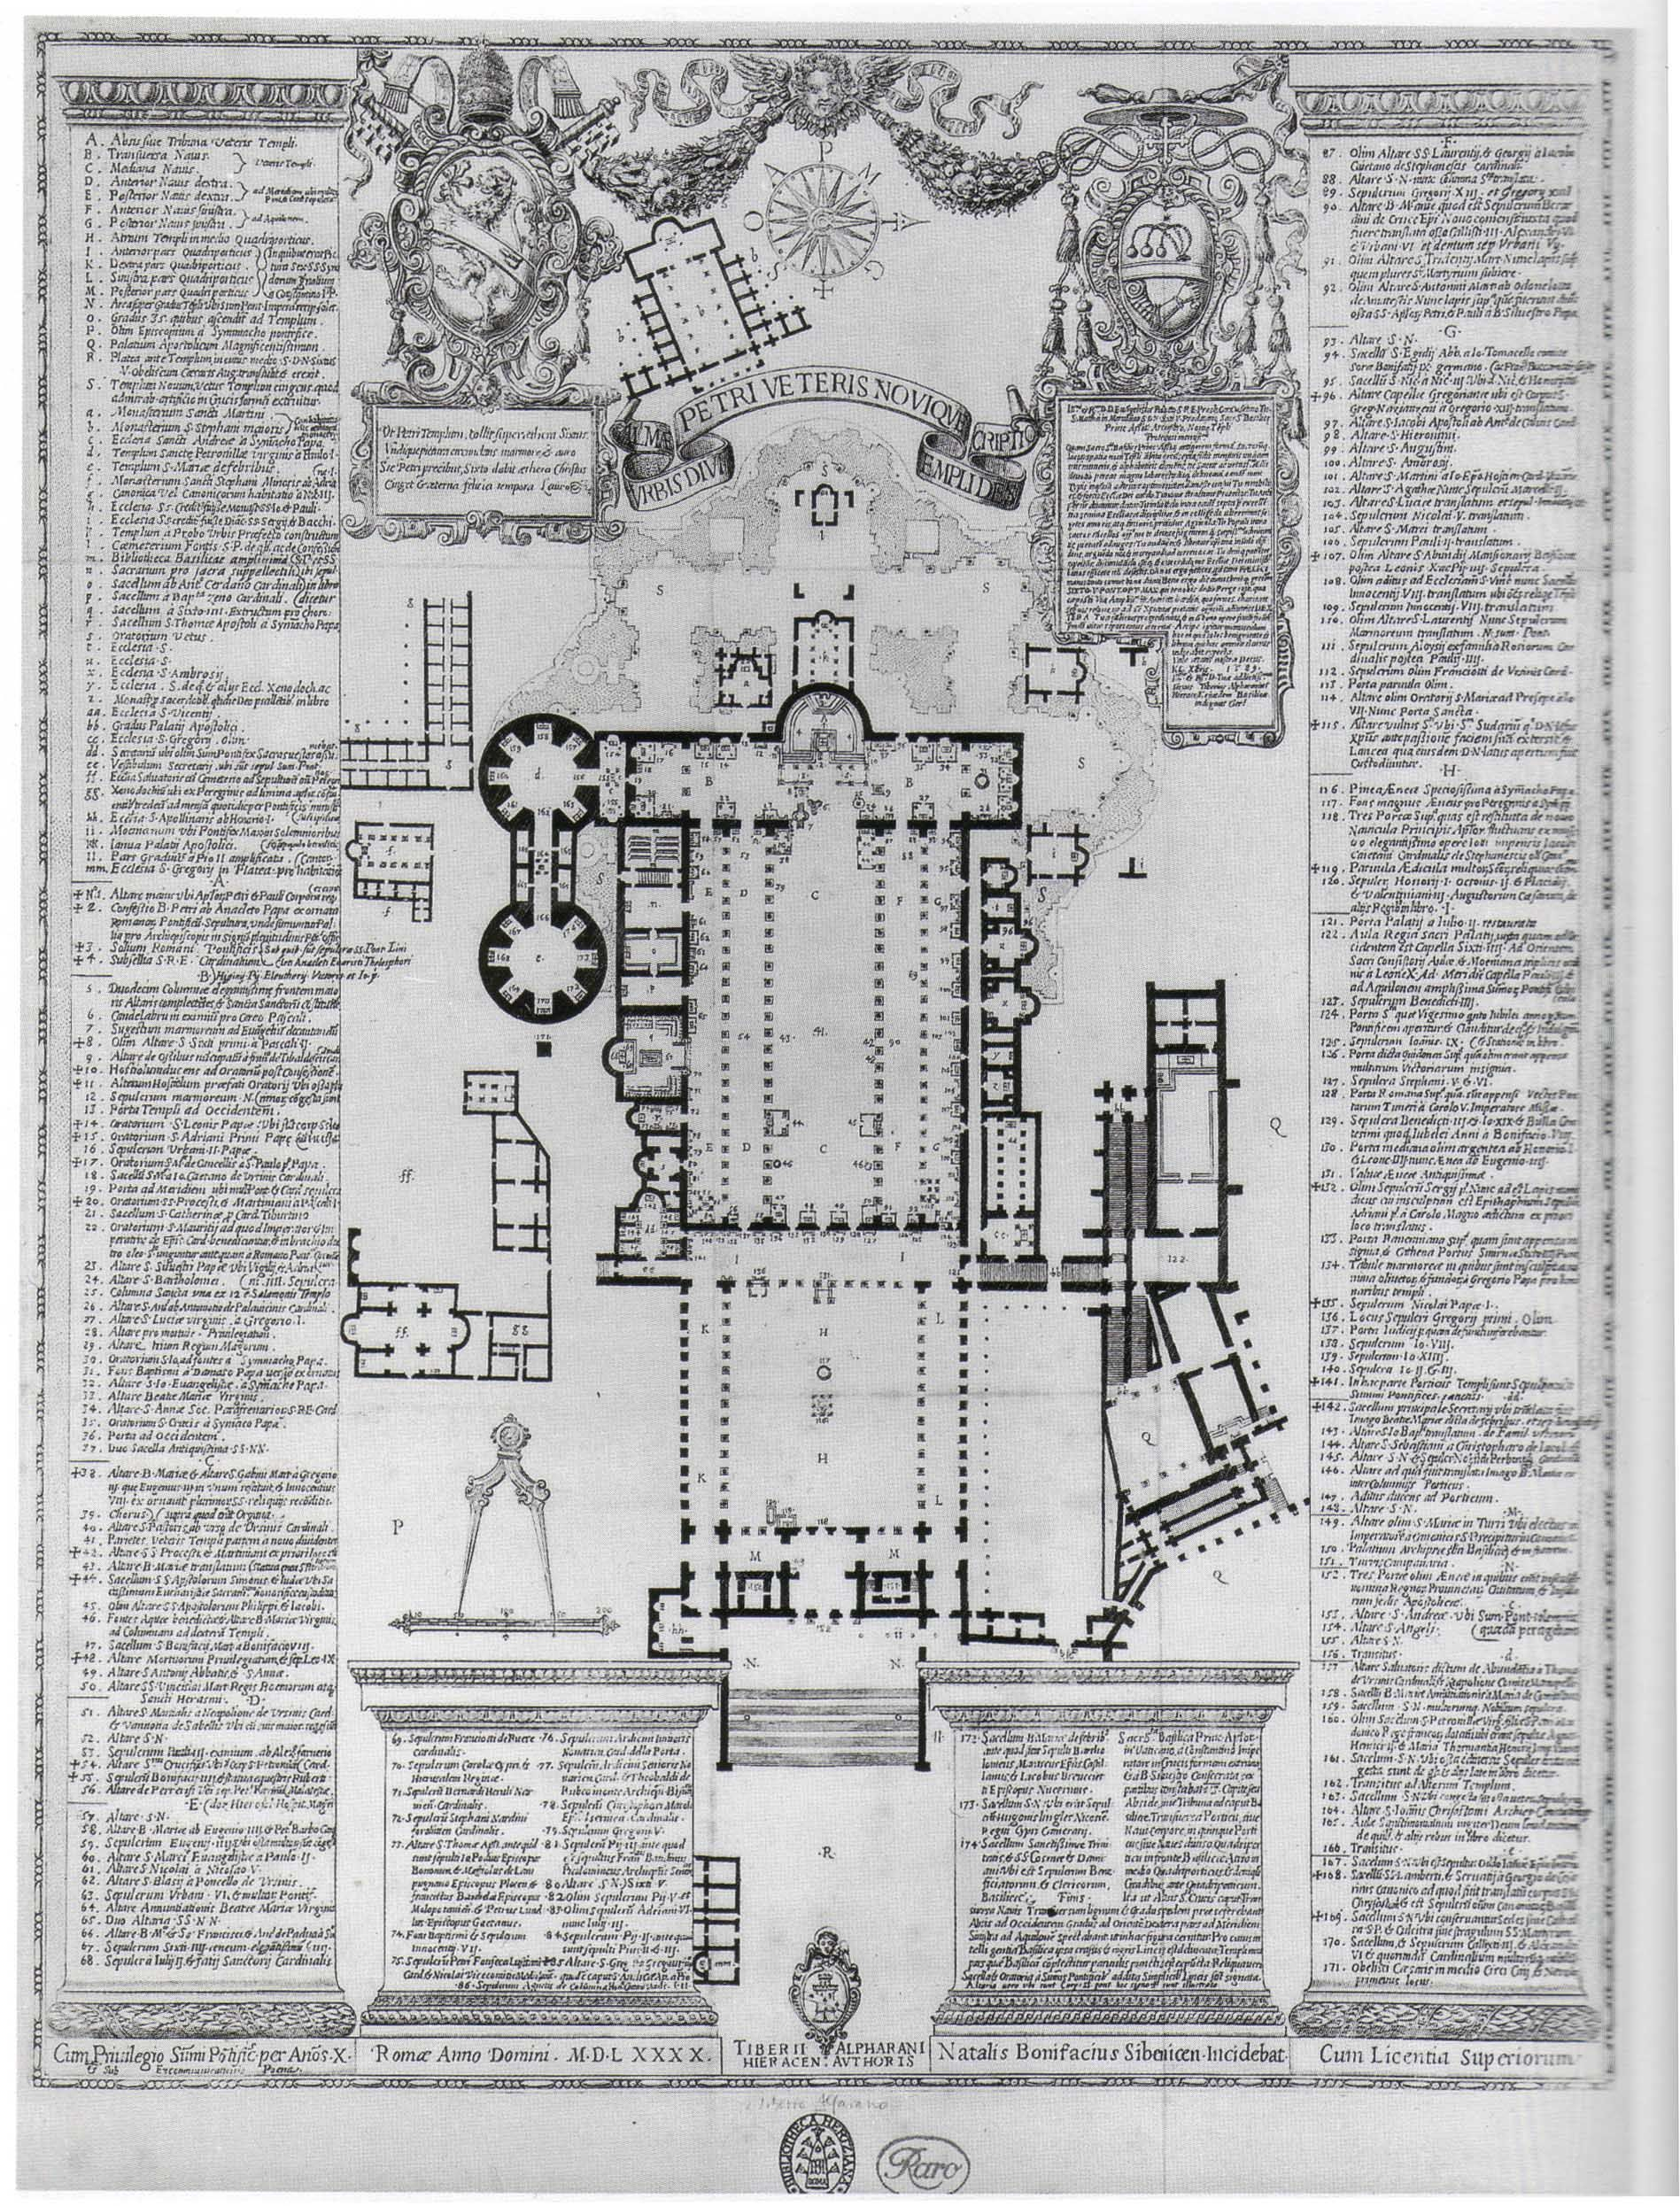 Old St. Peter's. Rome Floor plan architecture design